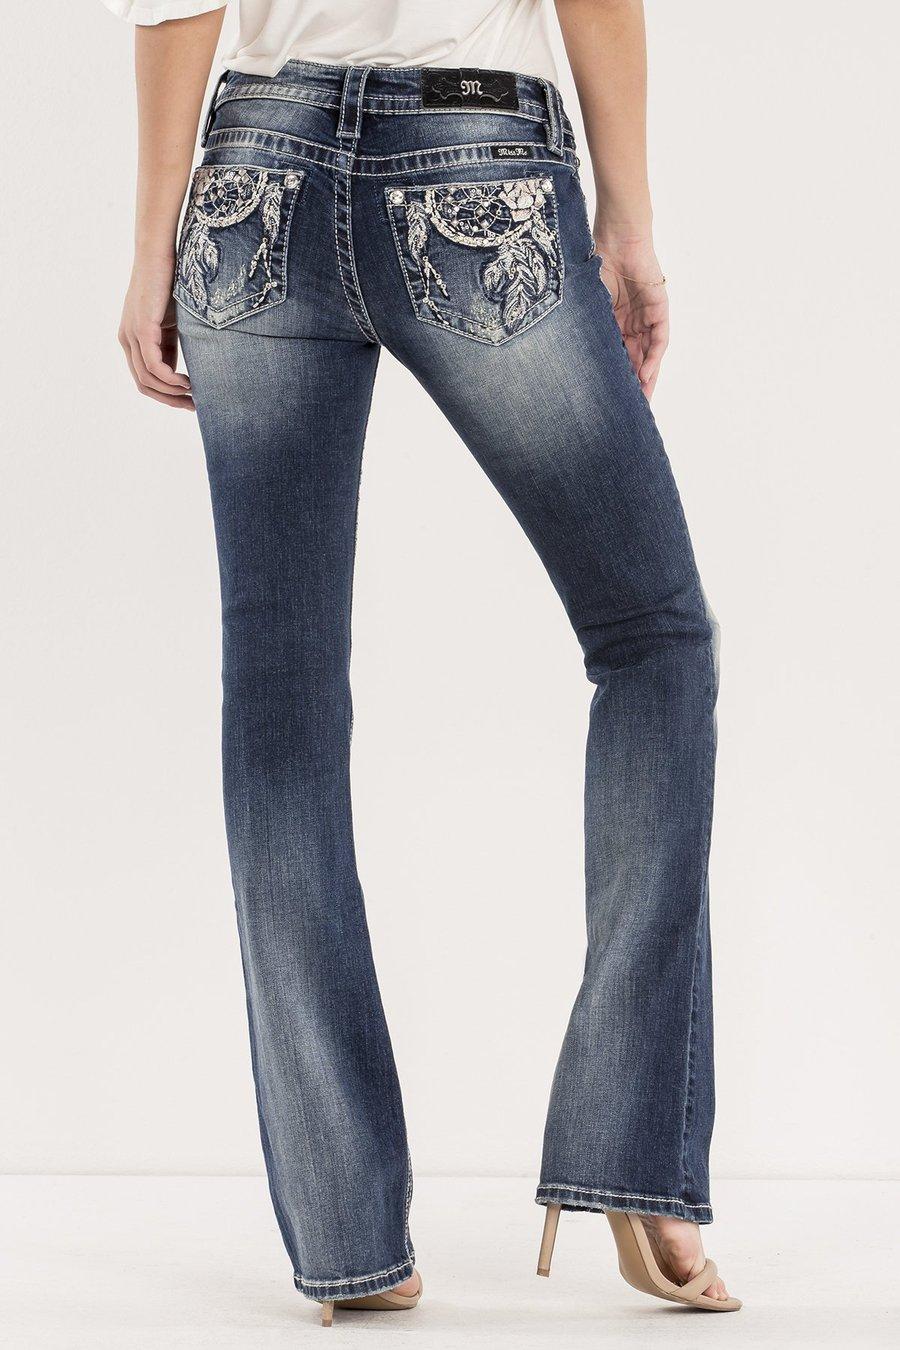 27deecf4bc9 Miss Me Dream Big Mid-Rise Boot Cut Jeans | Equine Divine